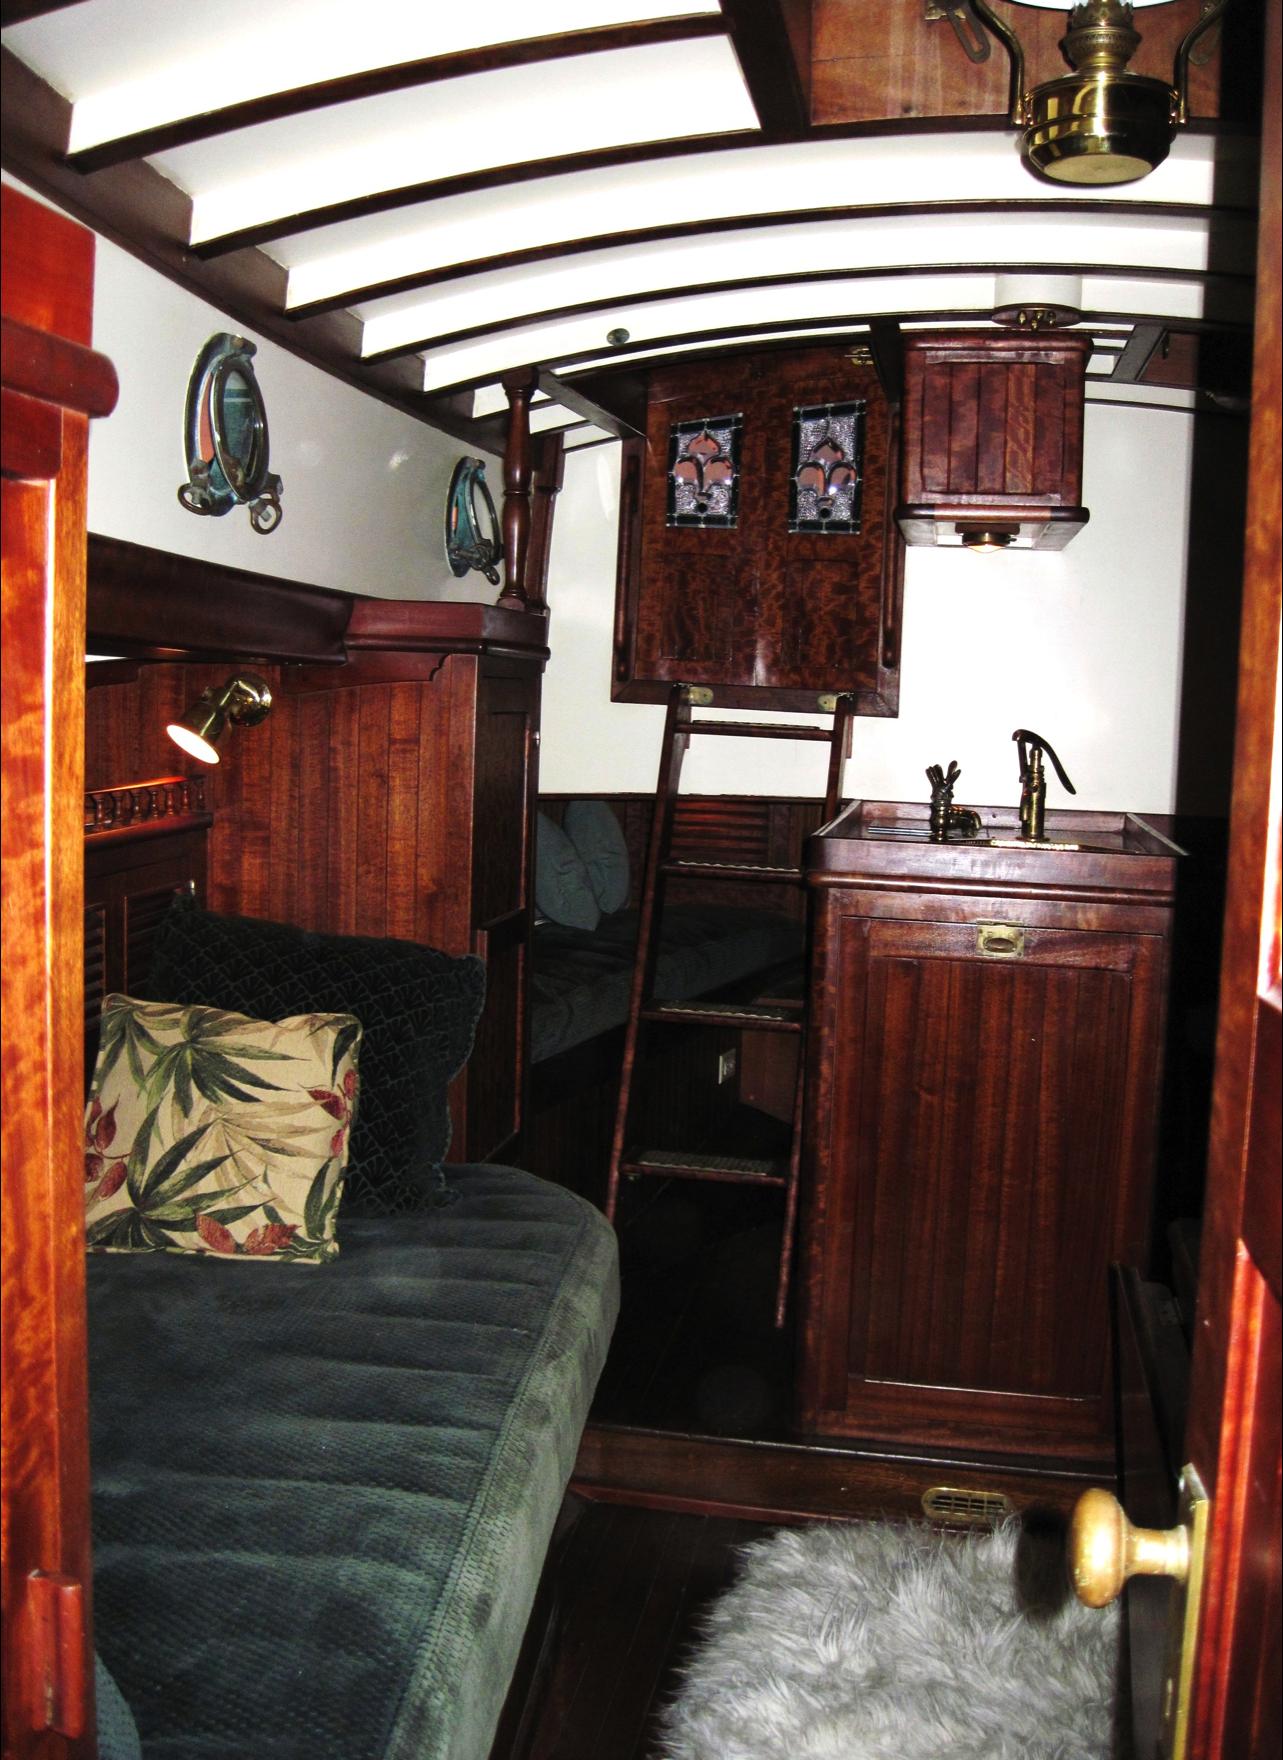 sea-Dream-yacht-restoration-interior.png